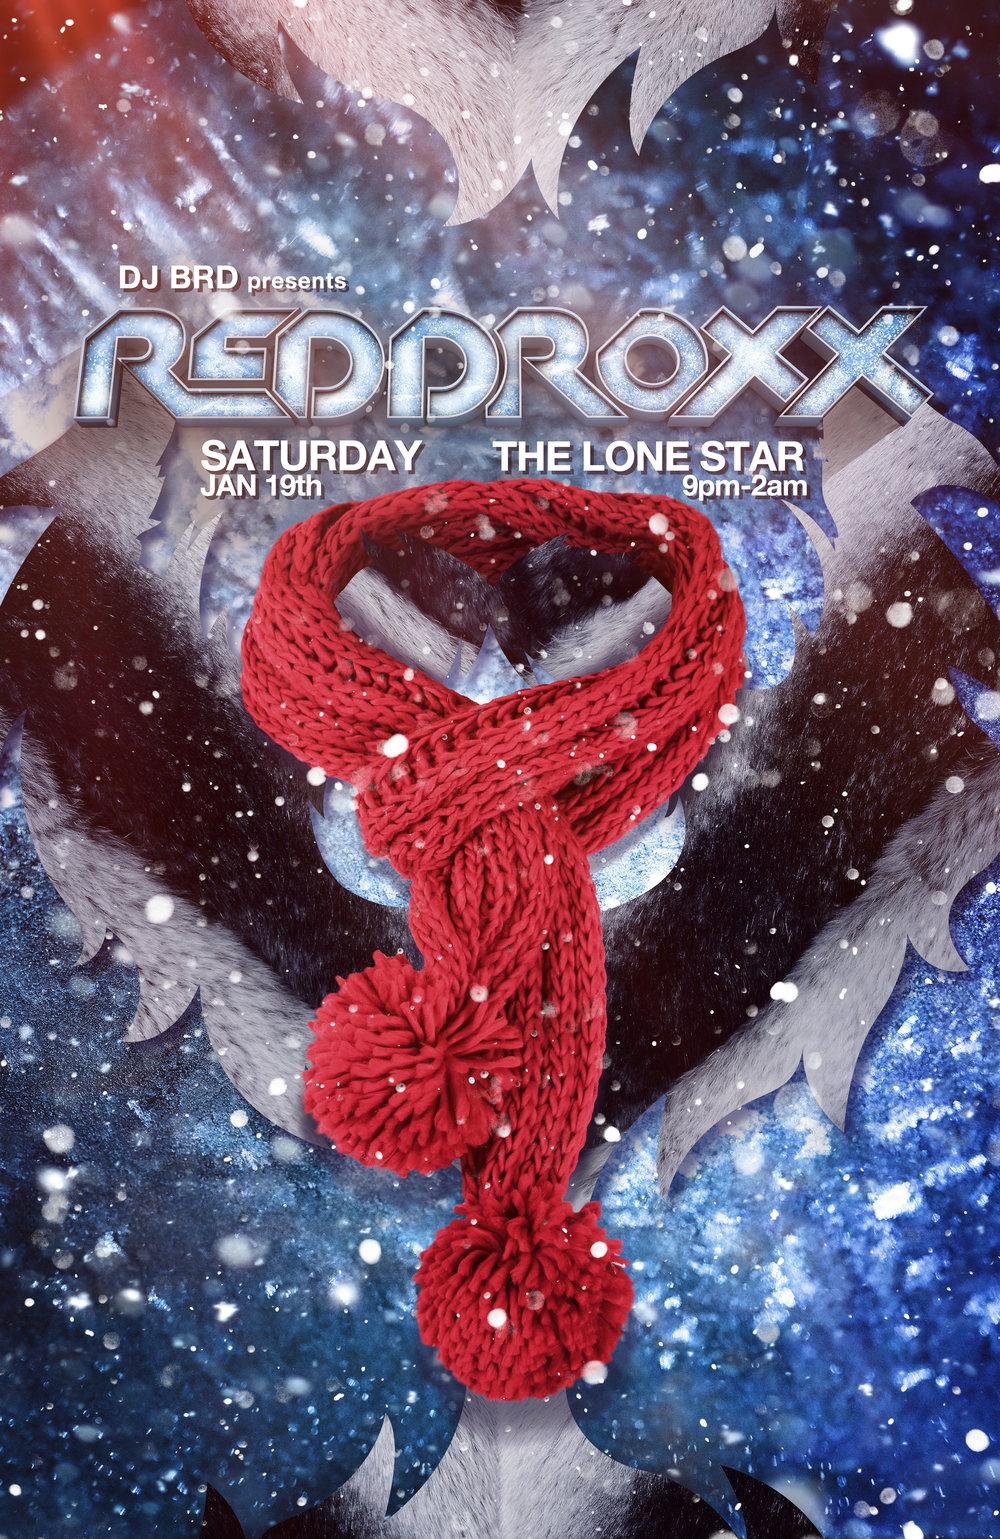 reddroxx_flyer82_11x17.jpg